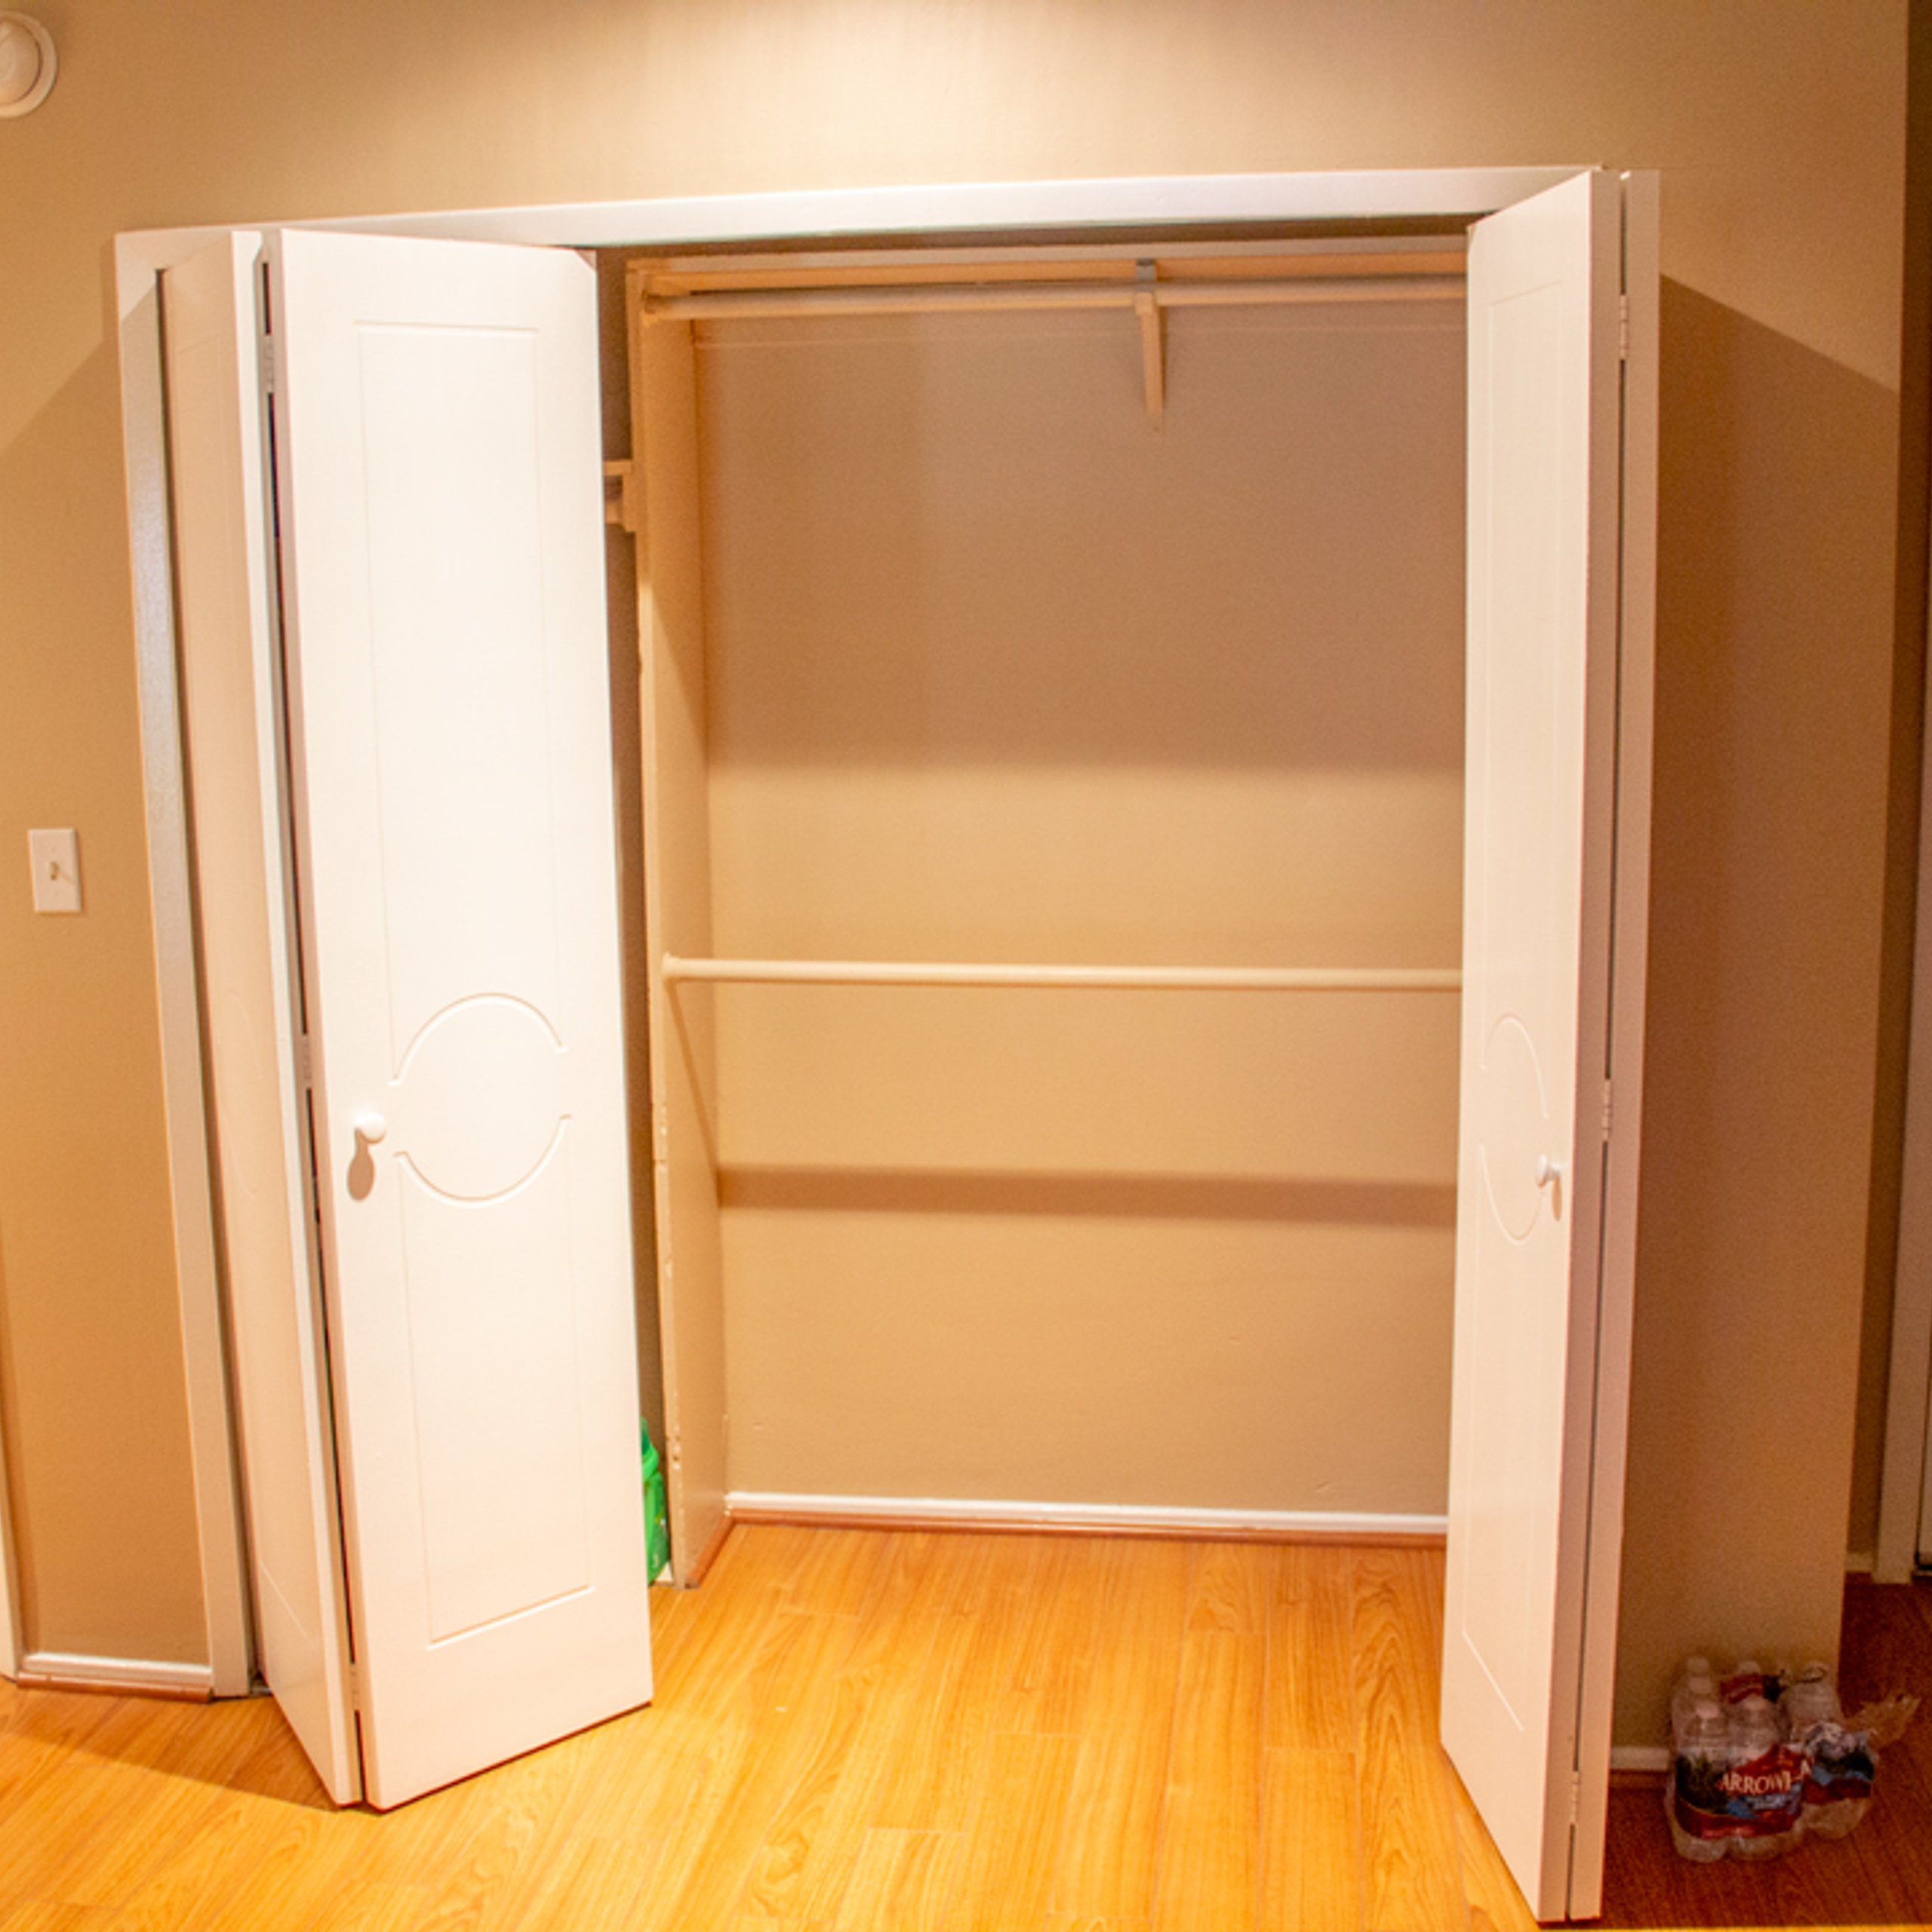 10x5 Closet self storage unit